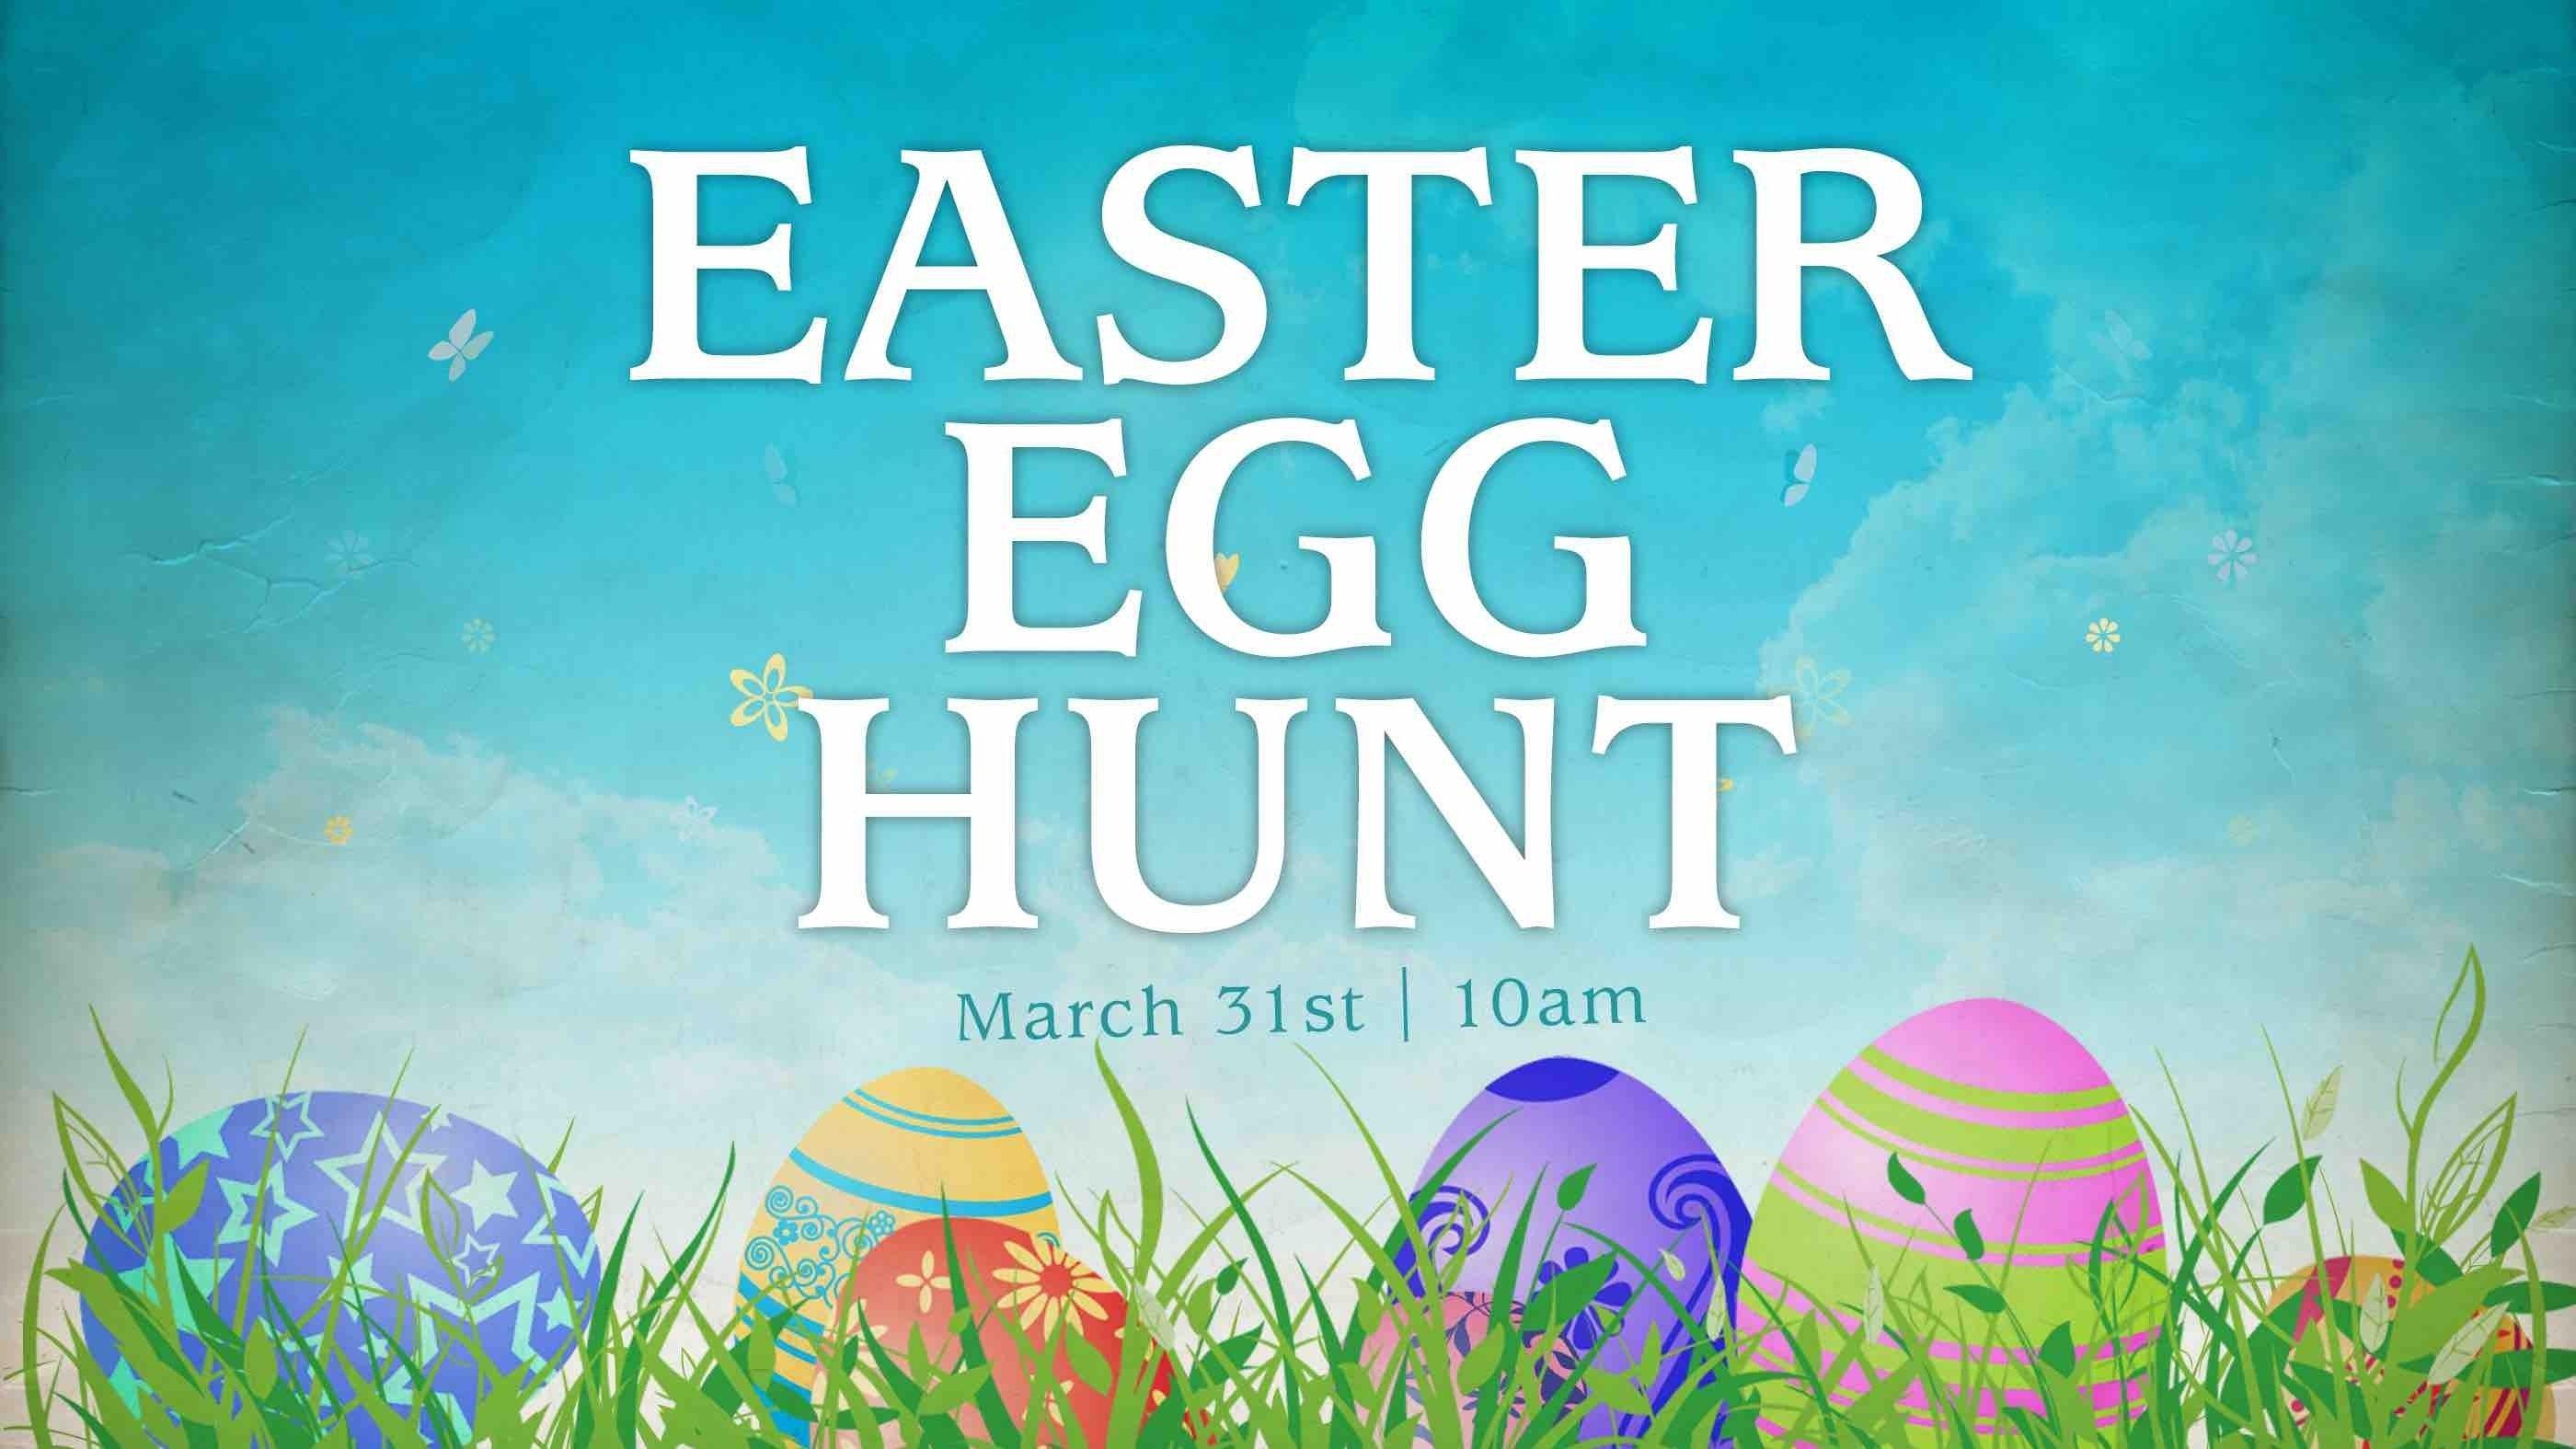 10 Beautiful Church Easter Egg Hunt Ideas community easter egg hunt starpoint church 2020